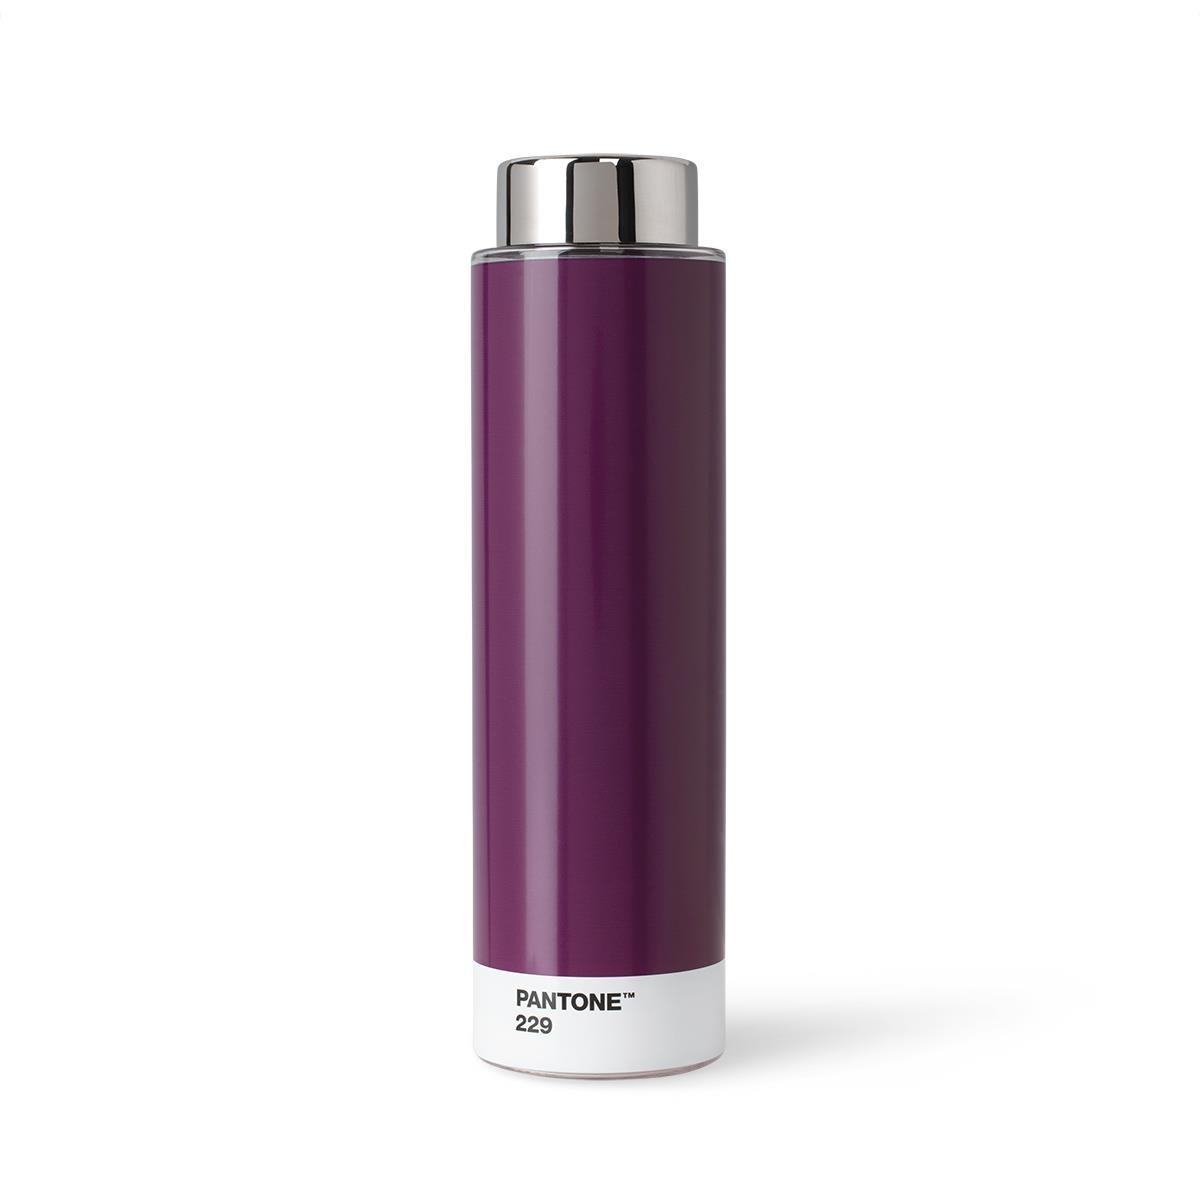 Borraccia Tritan - 500 ml - Acciaio Inossidabile - Viola Melanzana 229 - Set da 6 Pezzi